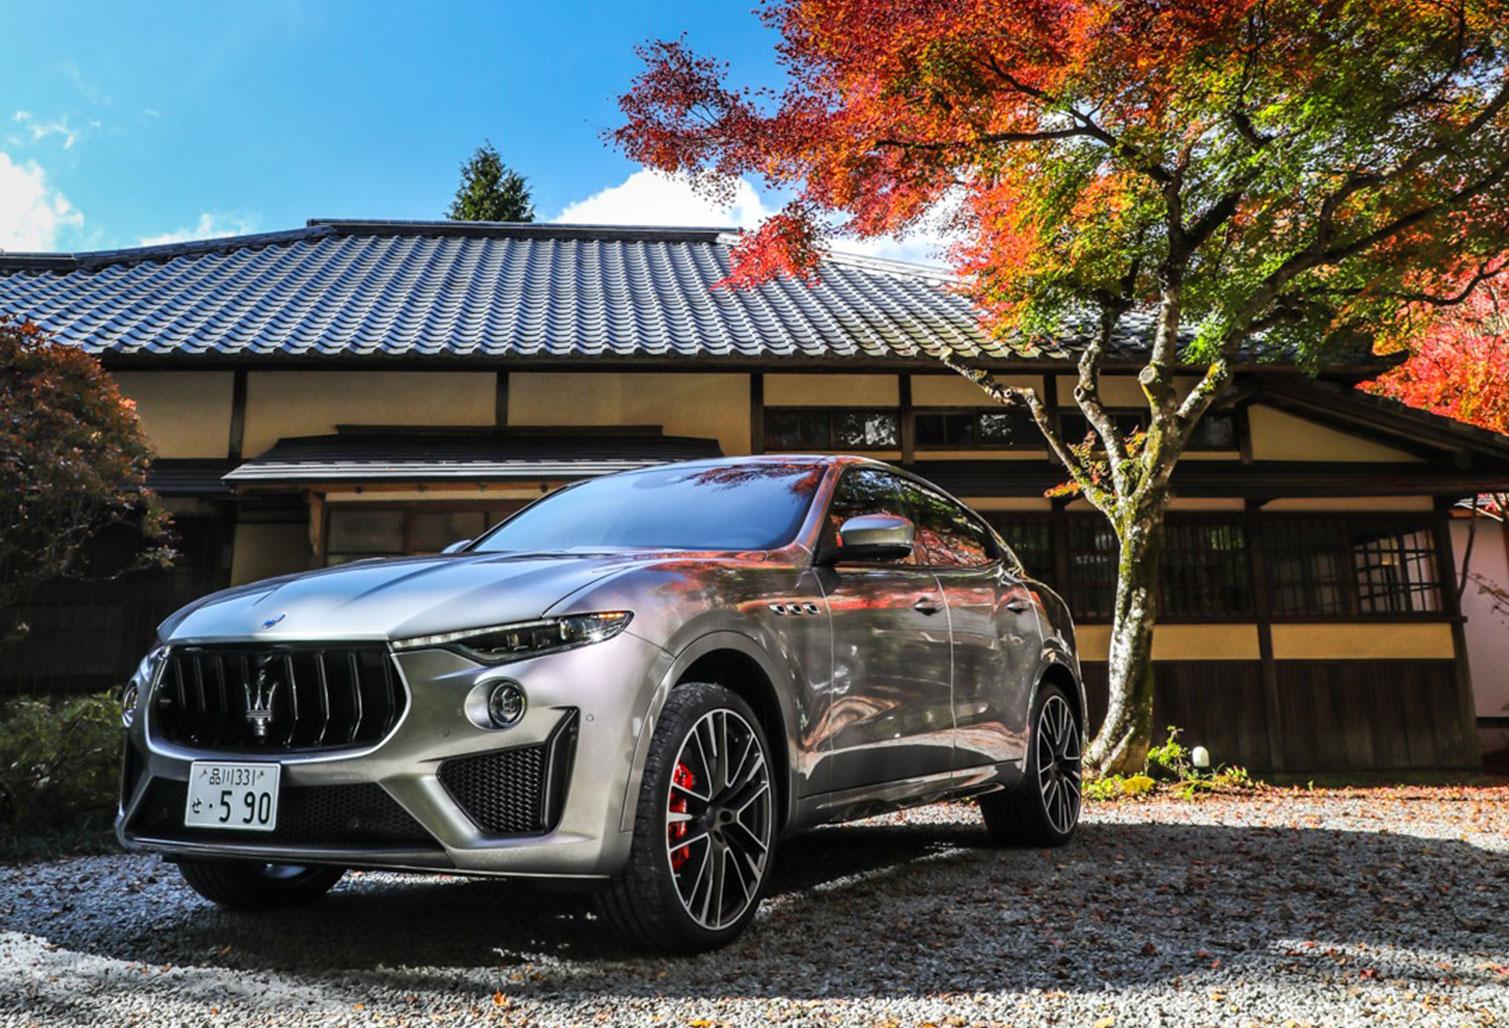 LGE_Maserati-Japan_1